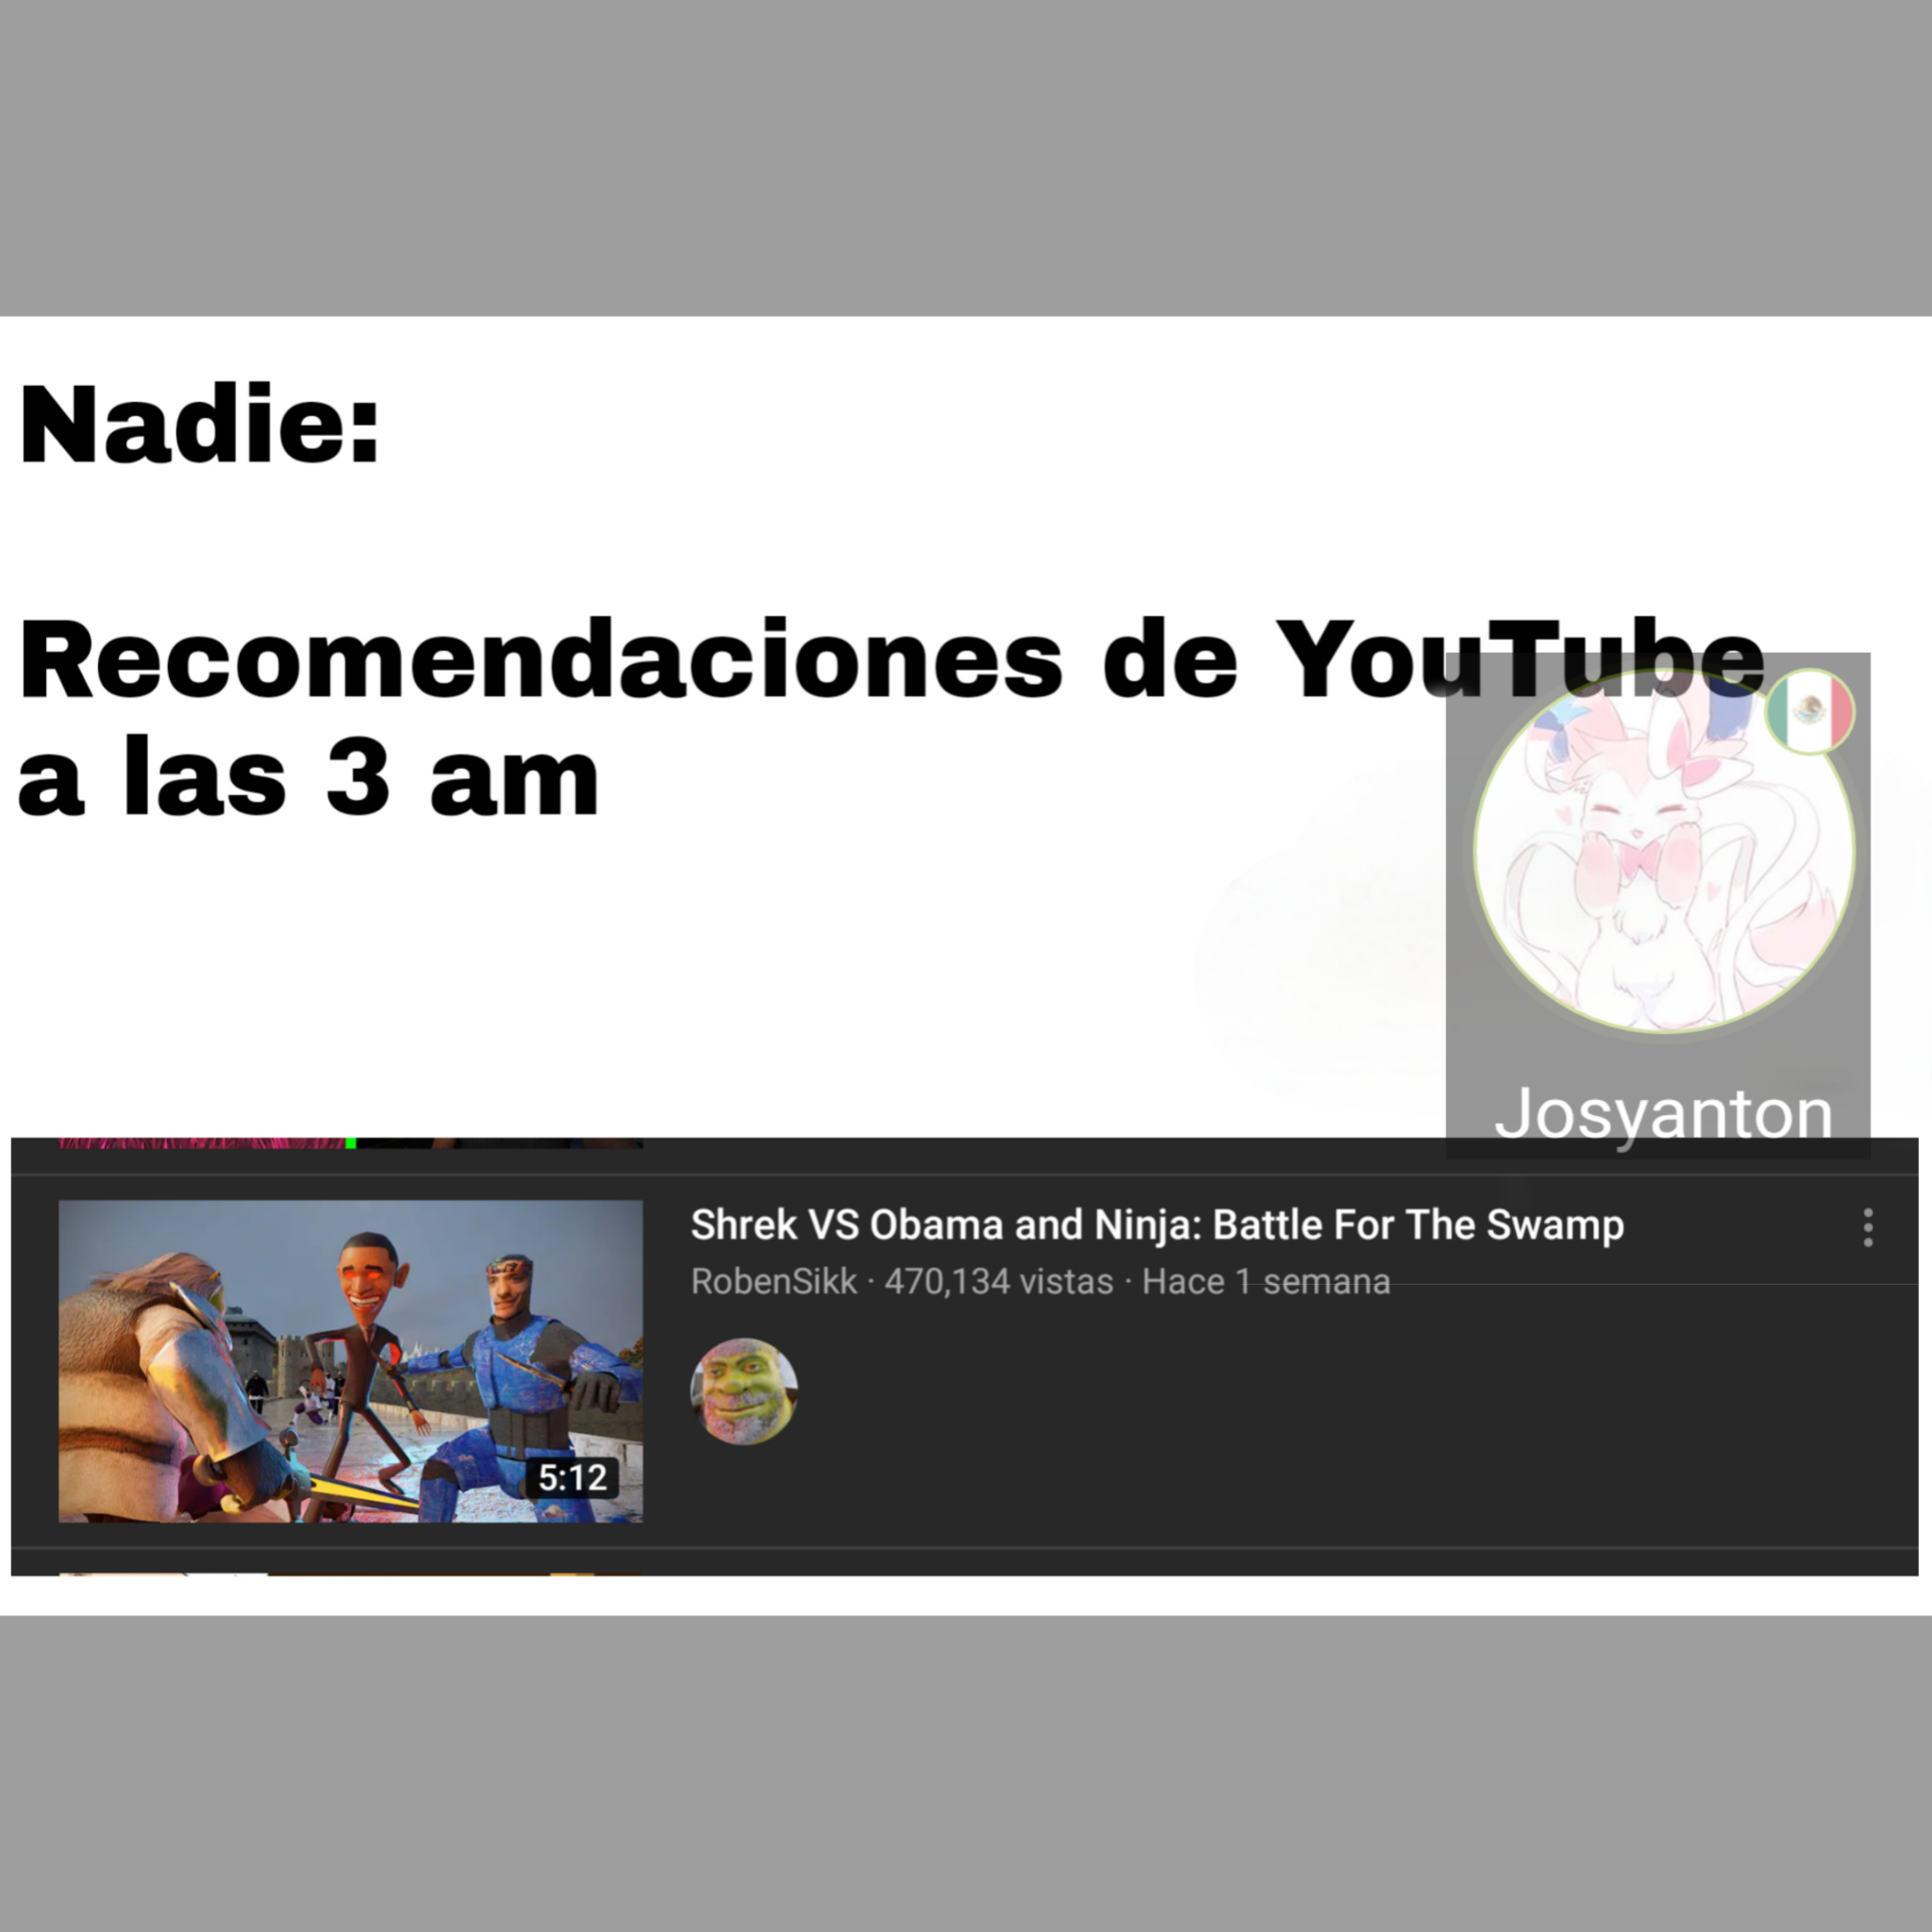 YouTube que brg - meme